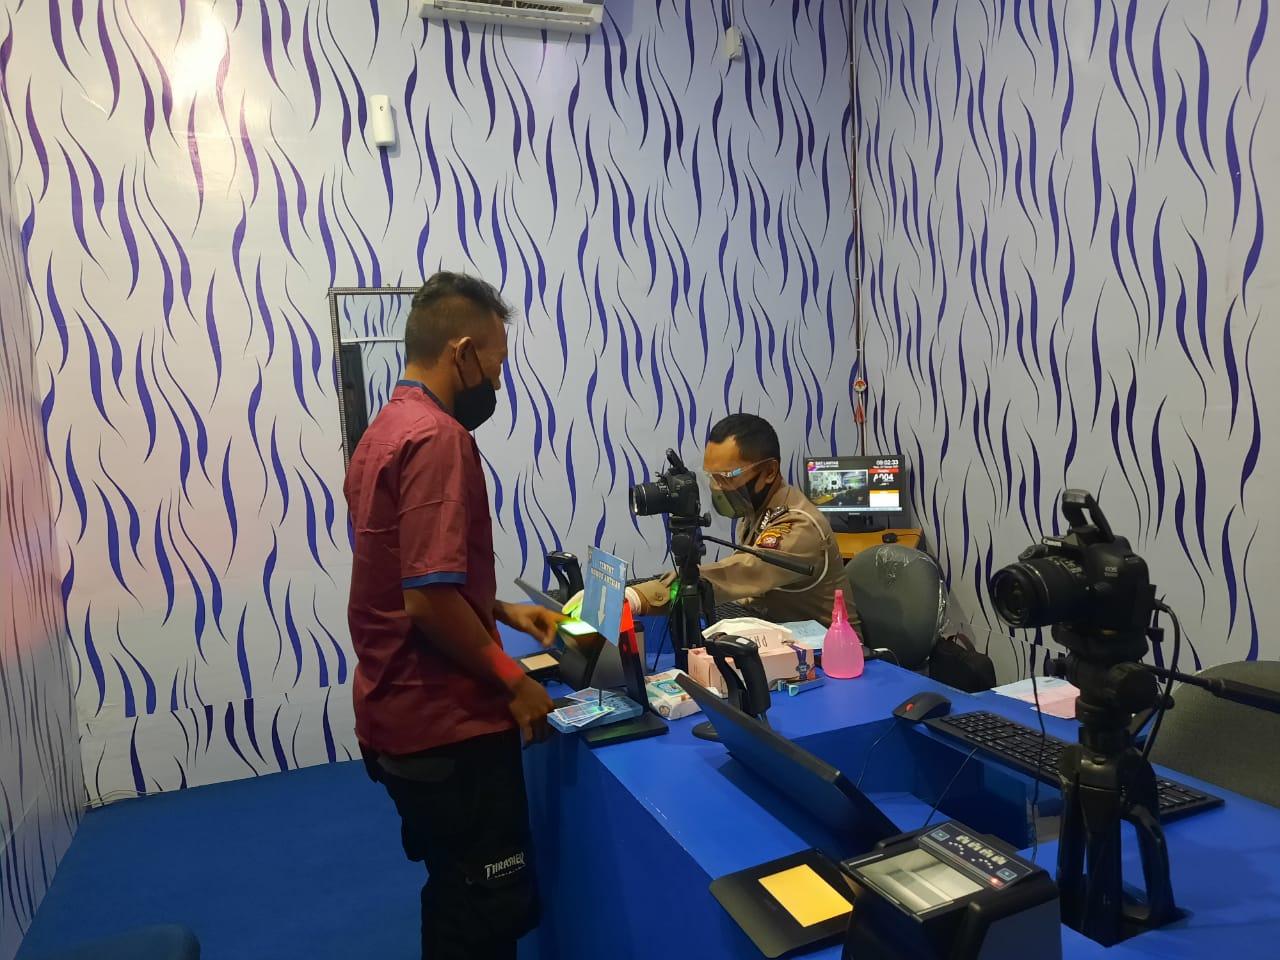 Pelaksanakan Proses Identifikasi SIM Guna Melengkapi Data Forensik Kepolisian